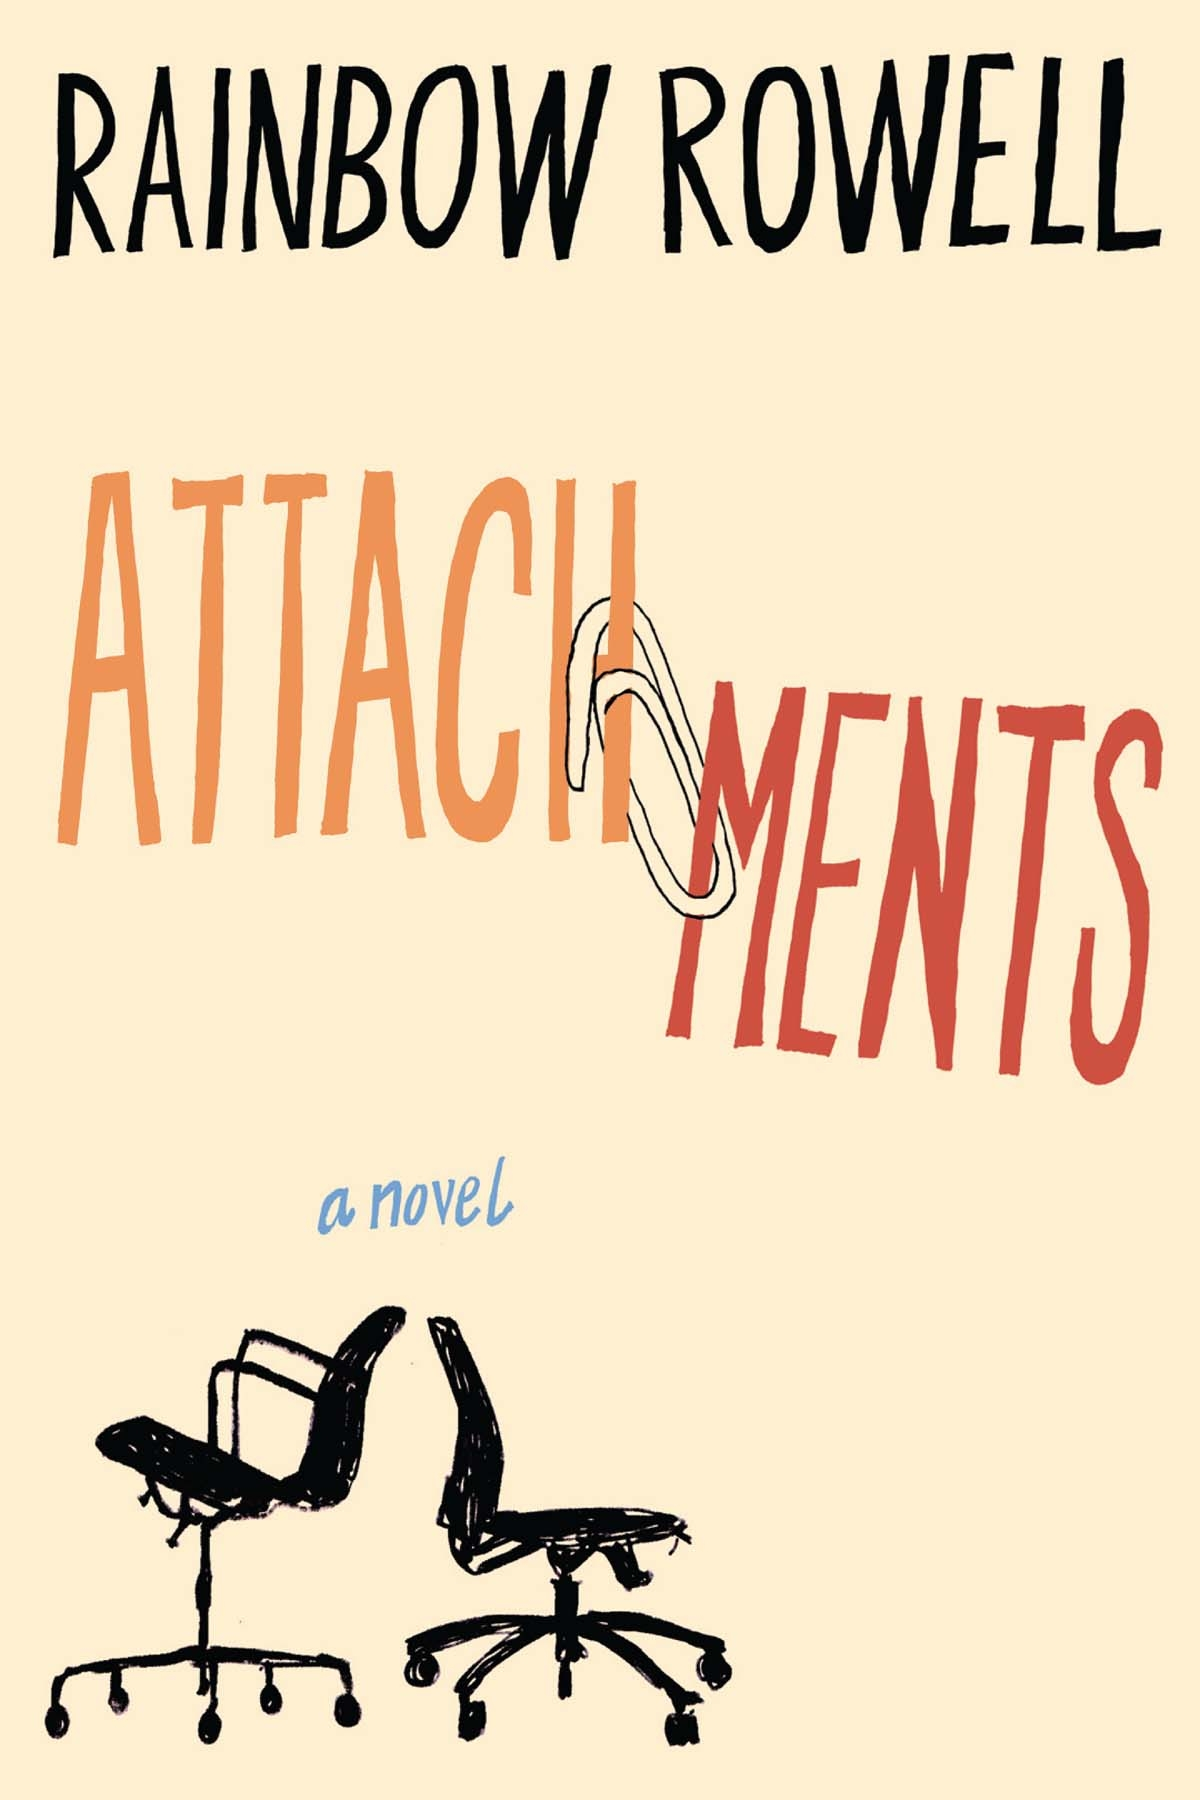 Attachments NEW.JPG